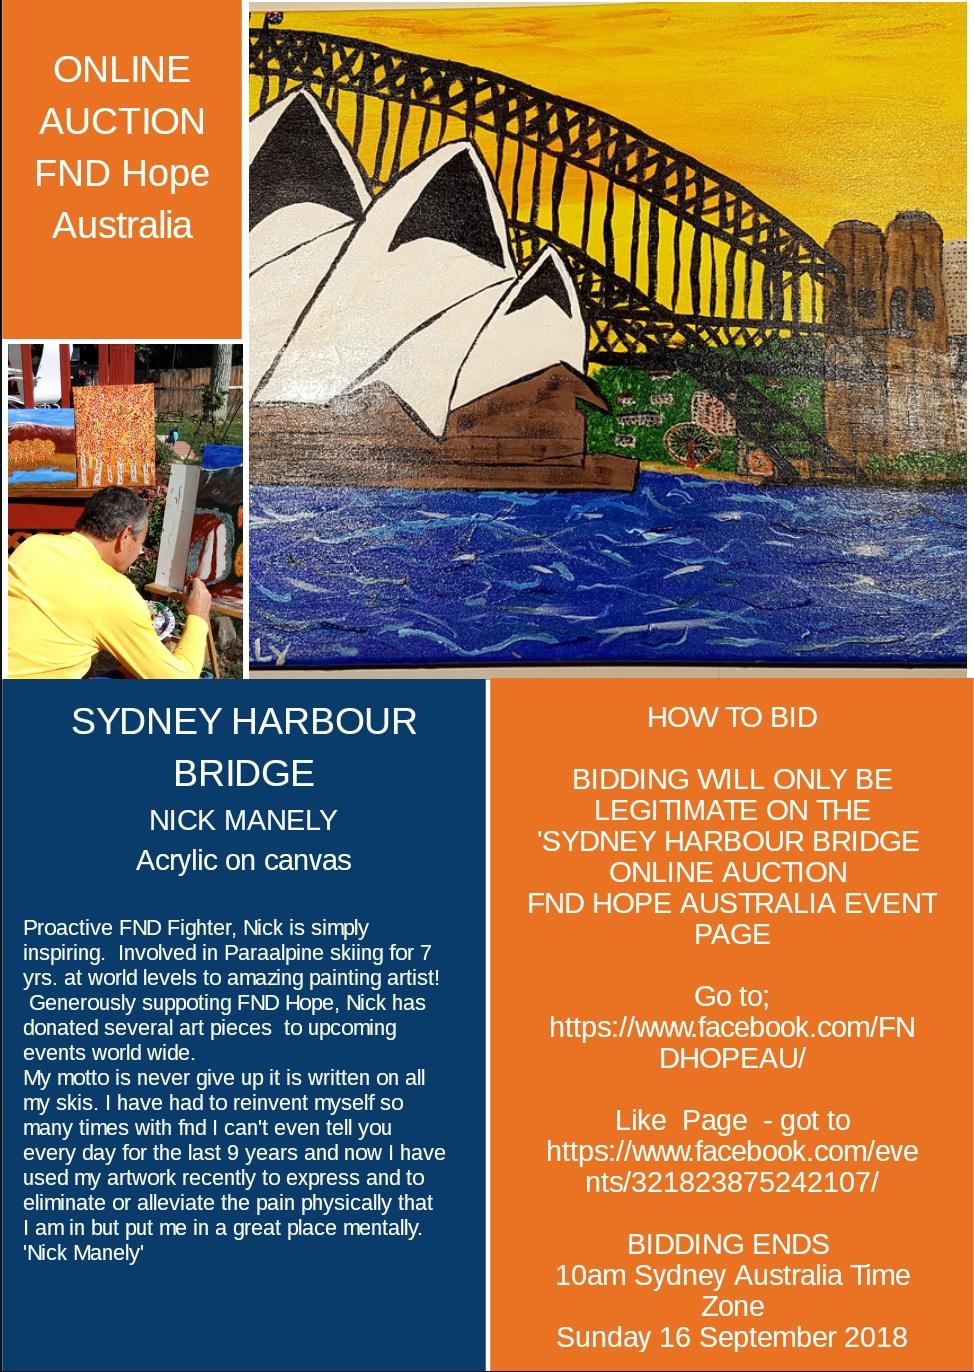 Sydney Harbour Bridge Online Auction Fnd Hope International